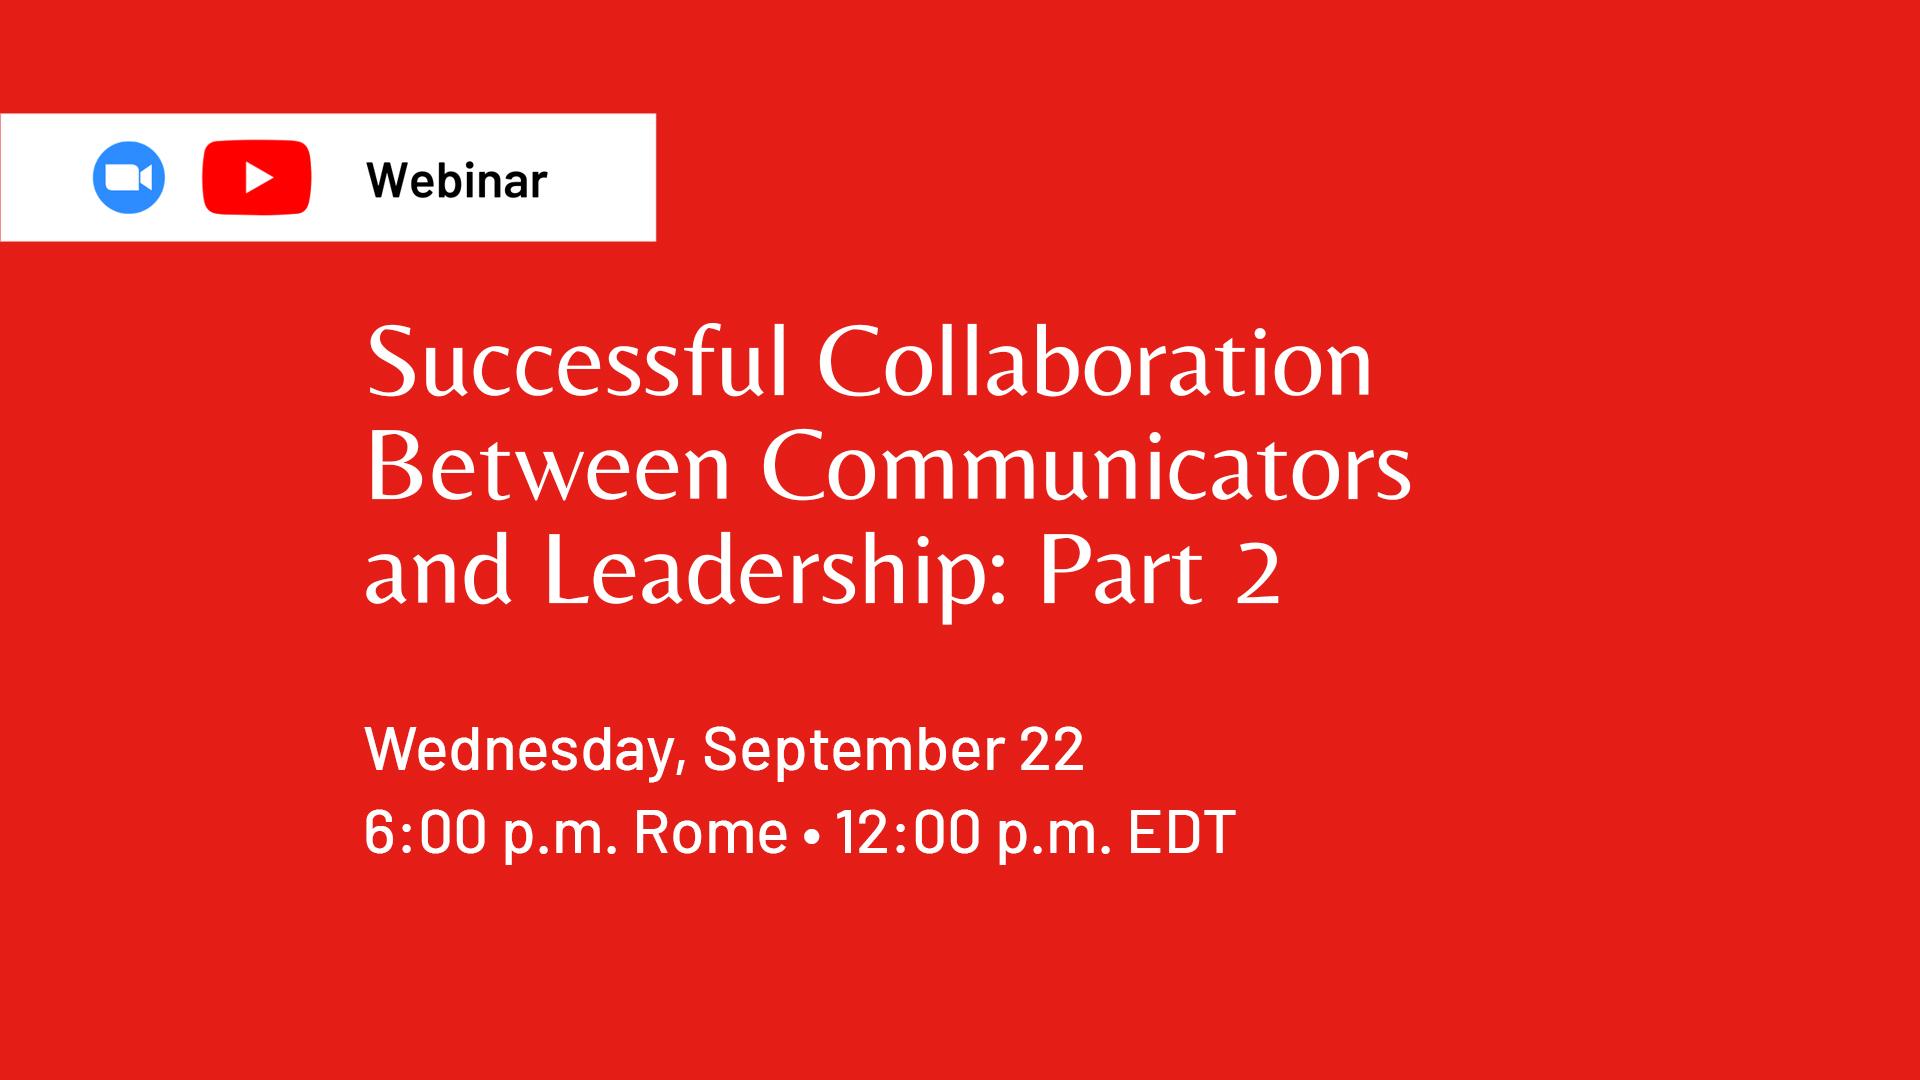 Webinar: Successful Collaboration Between Communicators and Leadership: Part 2